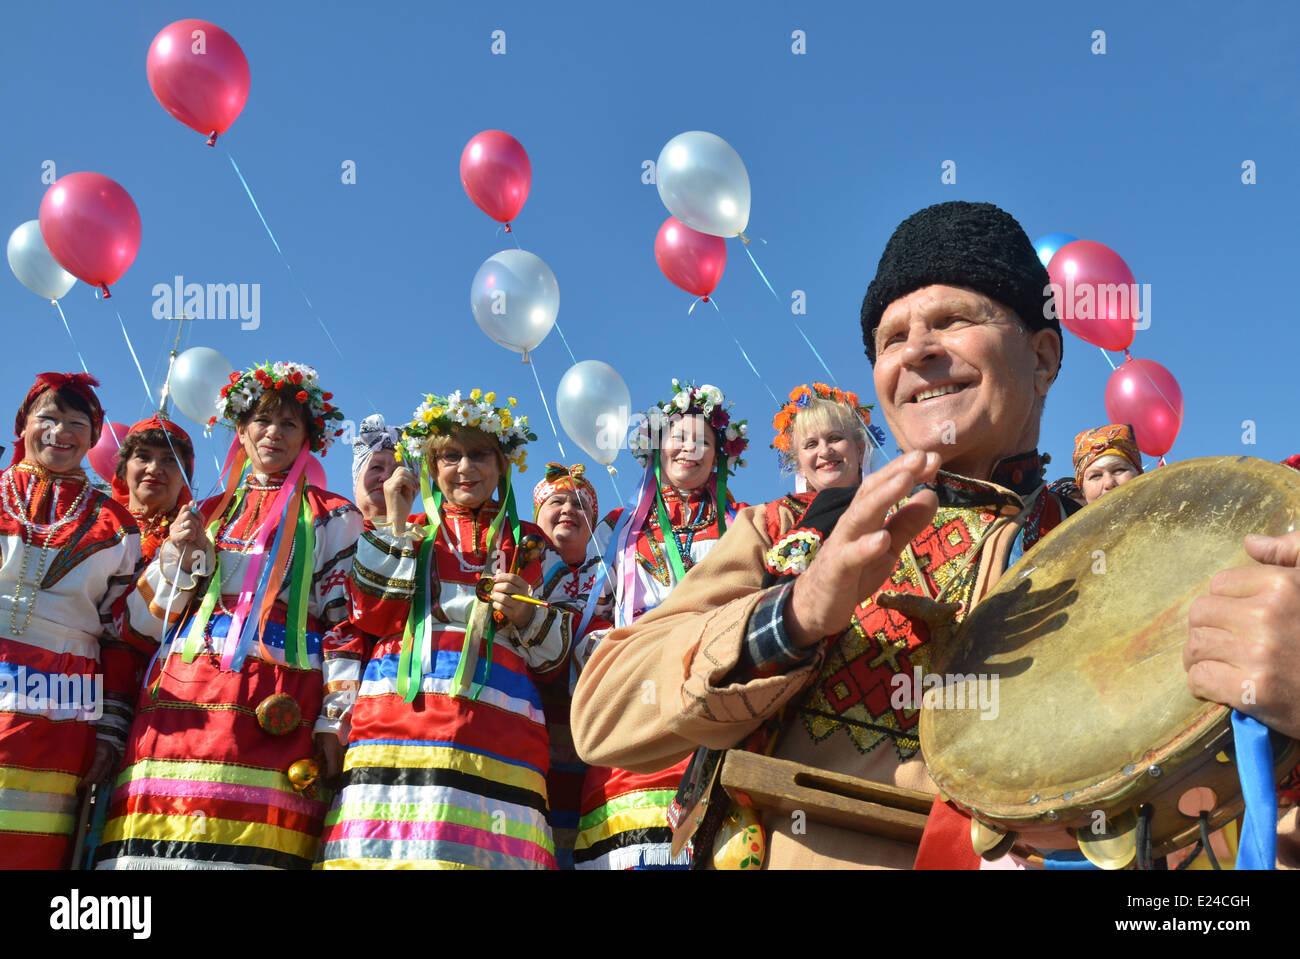 Costumes folkloriques ukrainiennes Photo Stock